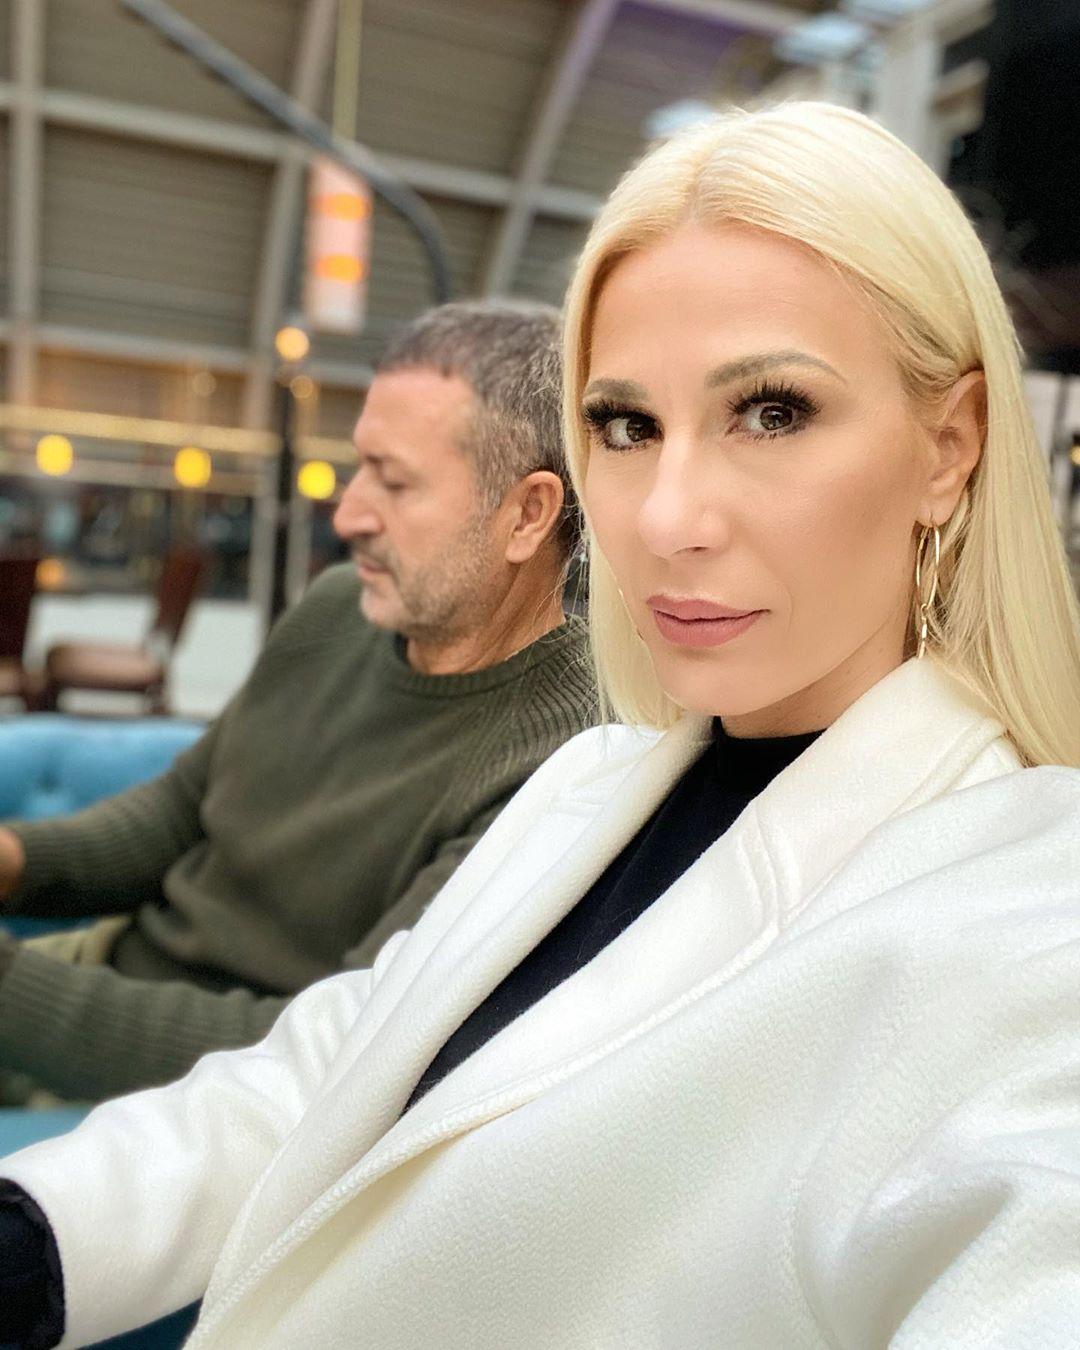 Vesna i Đole UNOVČILI SKANDAL: Evo zbog čega Đoganijevi ĆUTE O PREVARI!